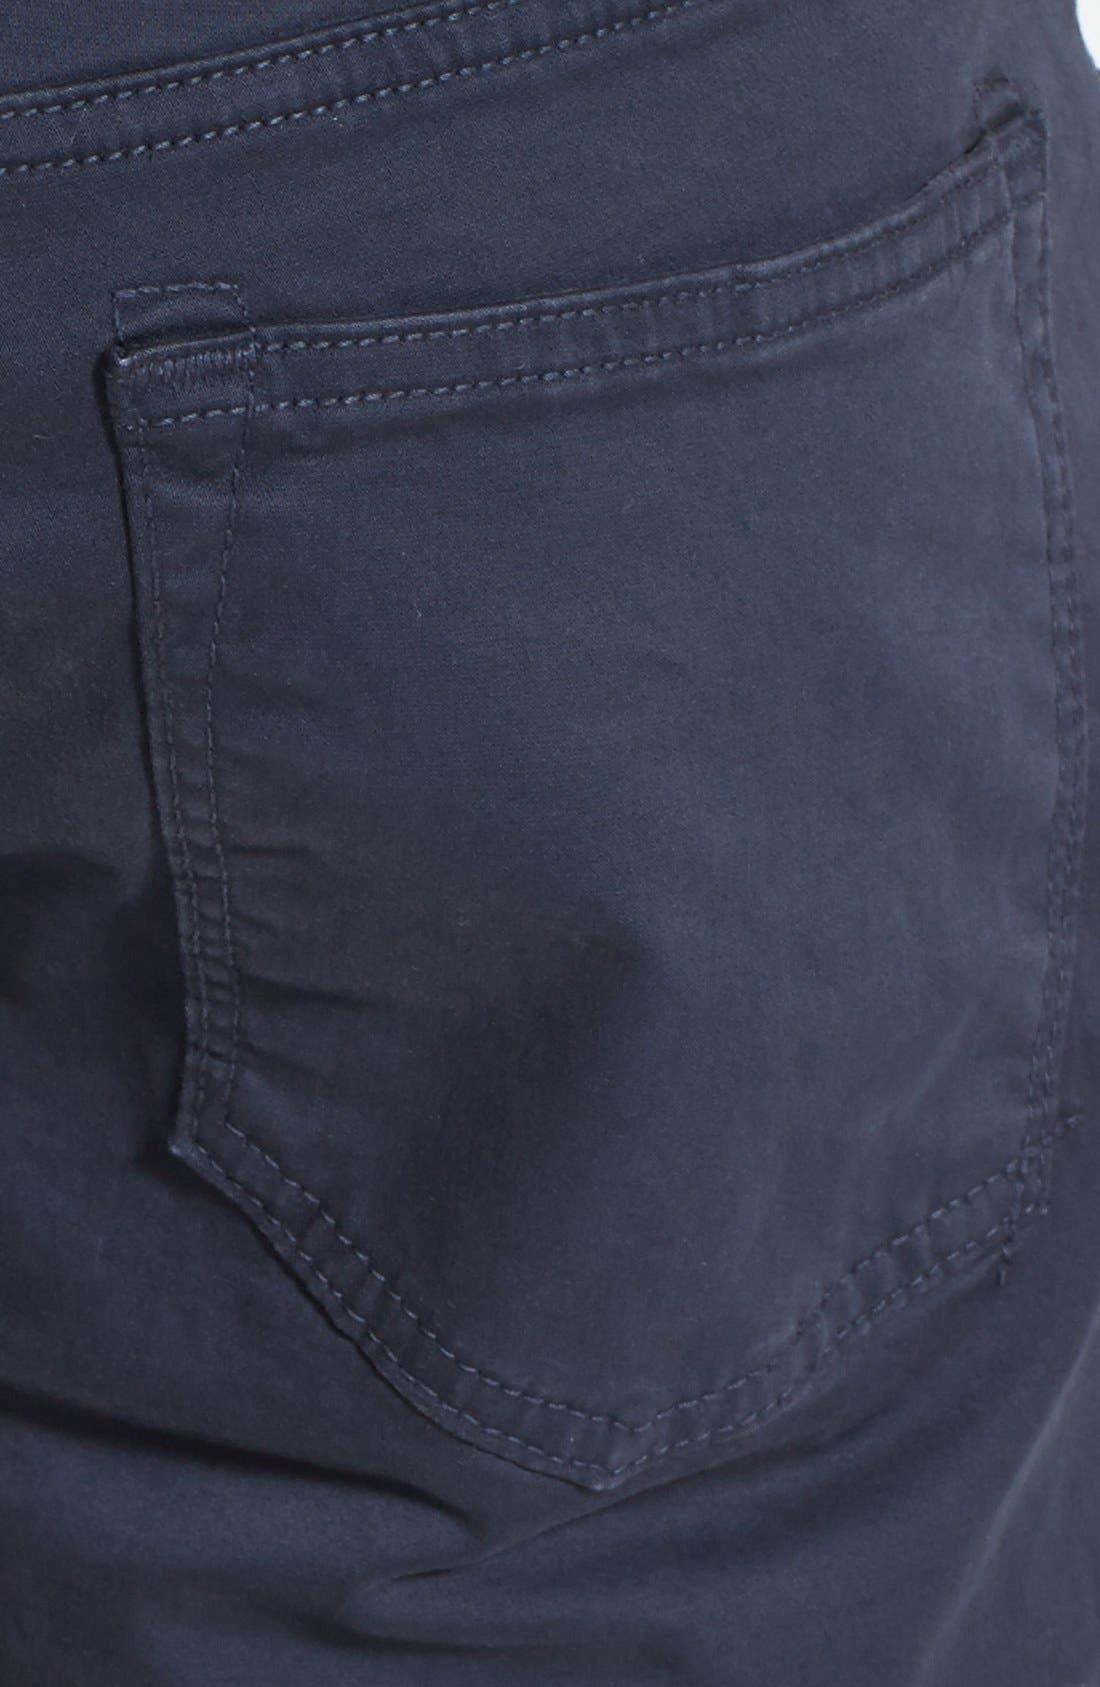 'Kane' Slim Fit Cotton Twill Pants,                             Alternate thumbnail 70, color,